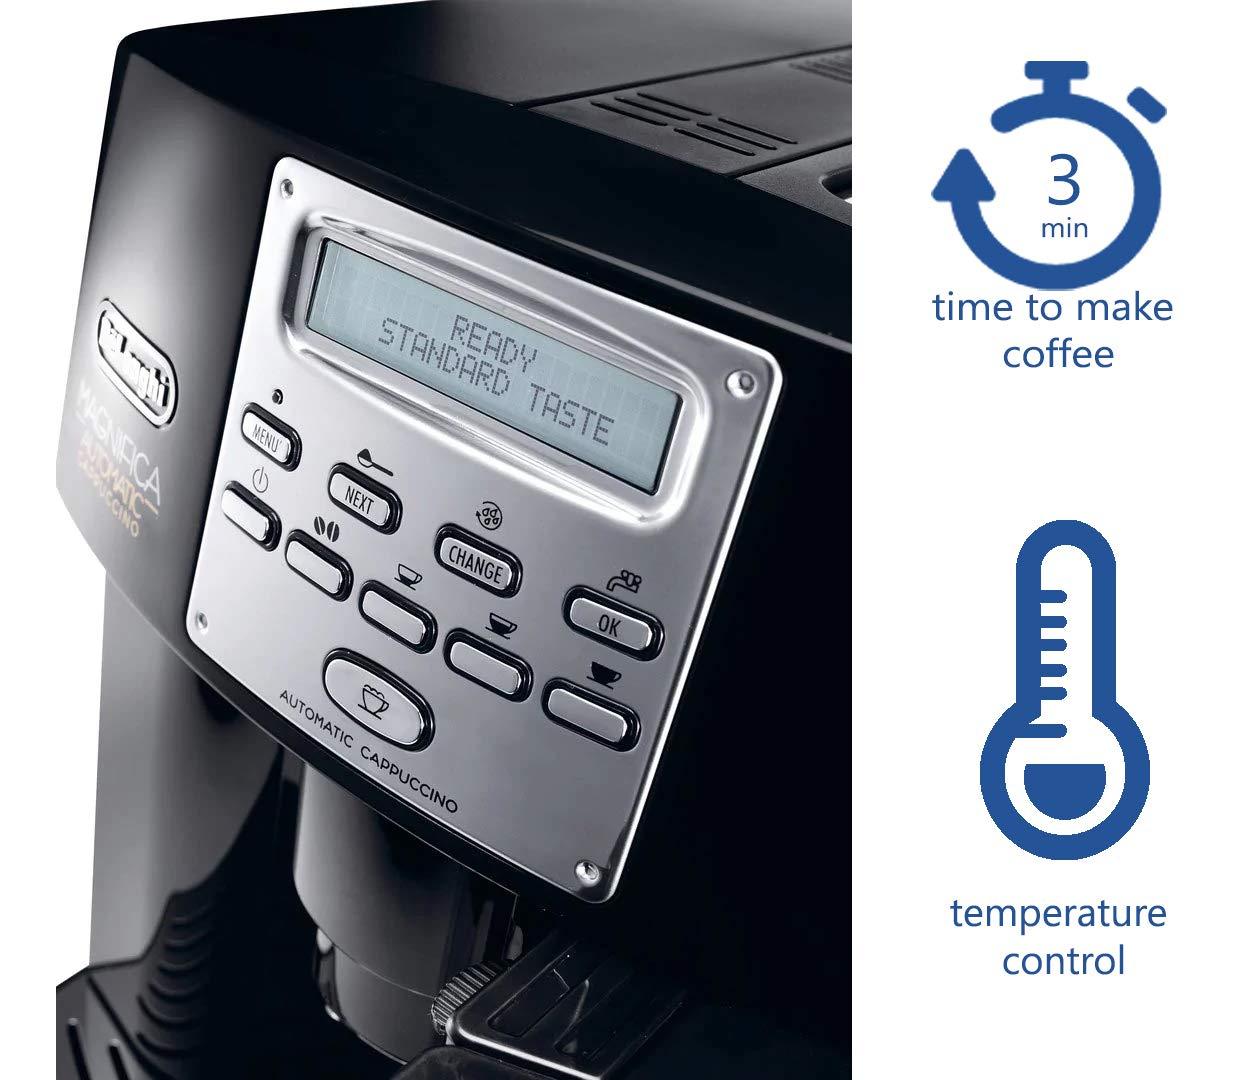 DeLonghi-ESAM-3550-Kaffee-Vollautomat-Magnifica-18L-15-bar-integriertes-Milchsystem-schwarz